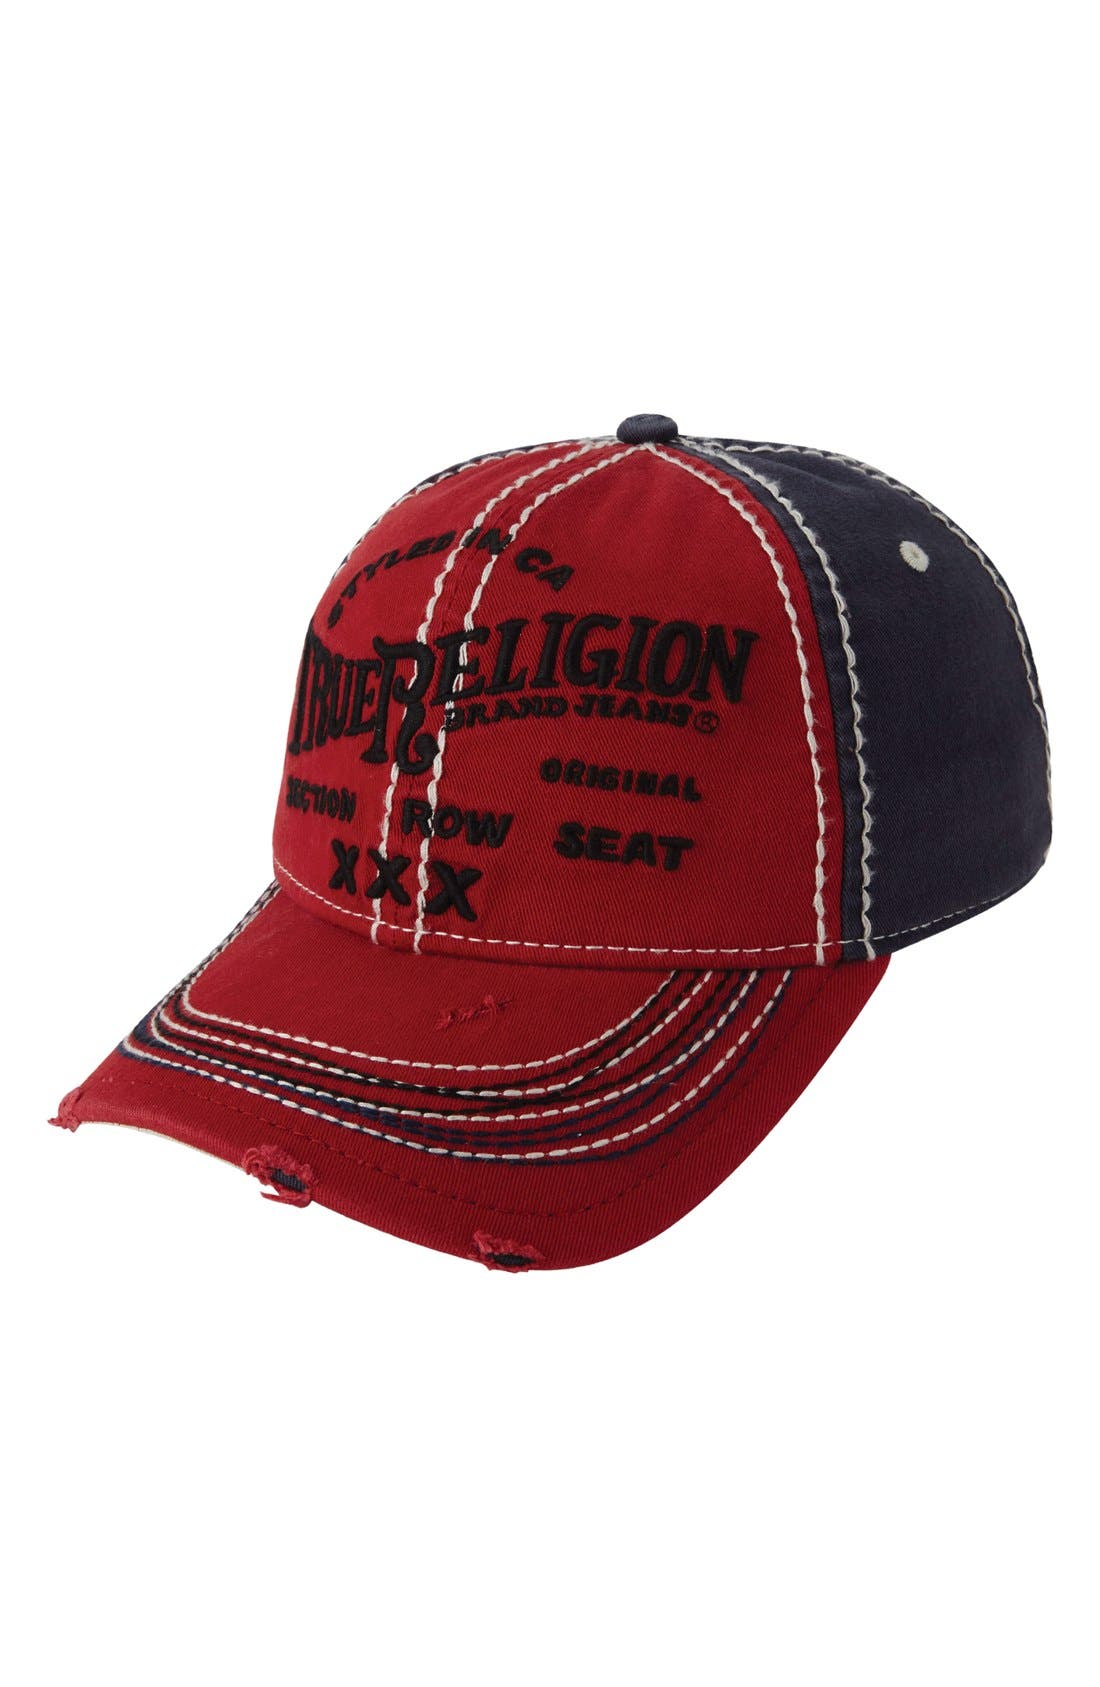 TRUE RELIGION BRAND JEANS Triple X Baseball Cap